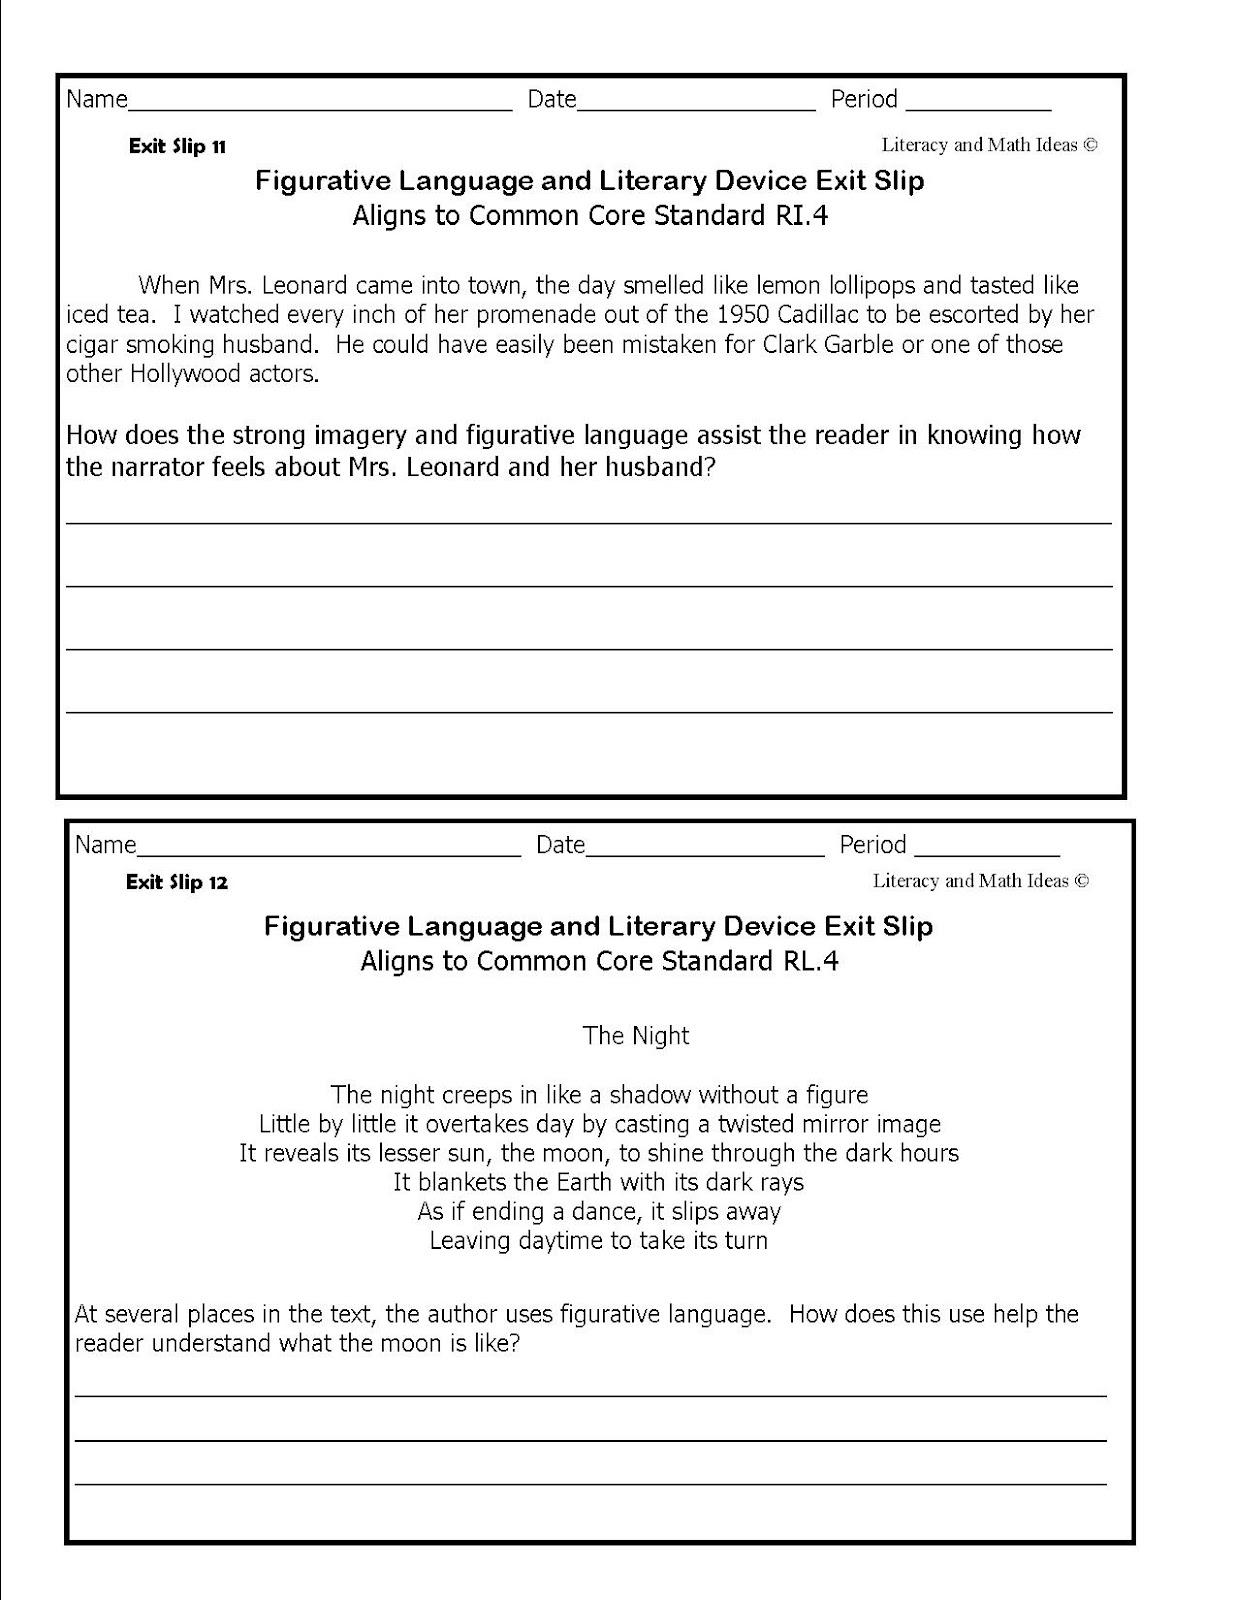 Literacy & Math Ideas: Figurative Language Exit Slips